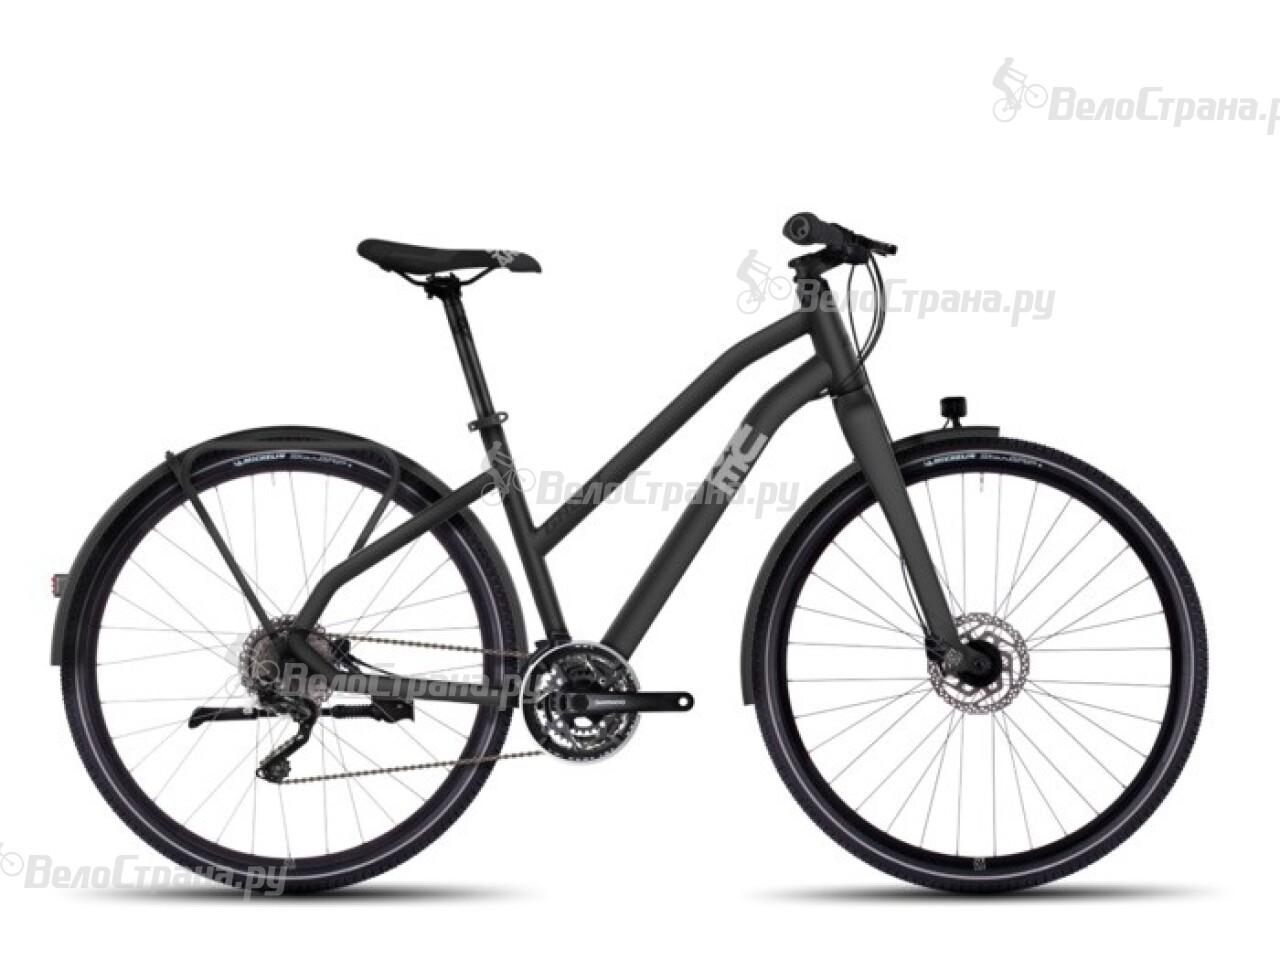 Велосипед Ghost SQUARE Urban X 8 Miss (2016) цены онлайн